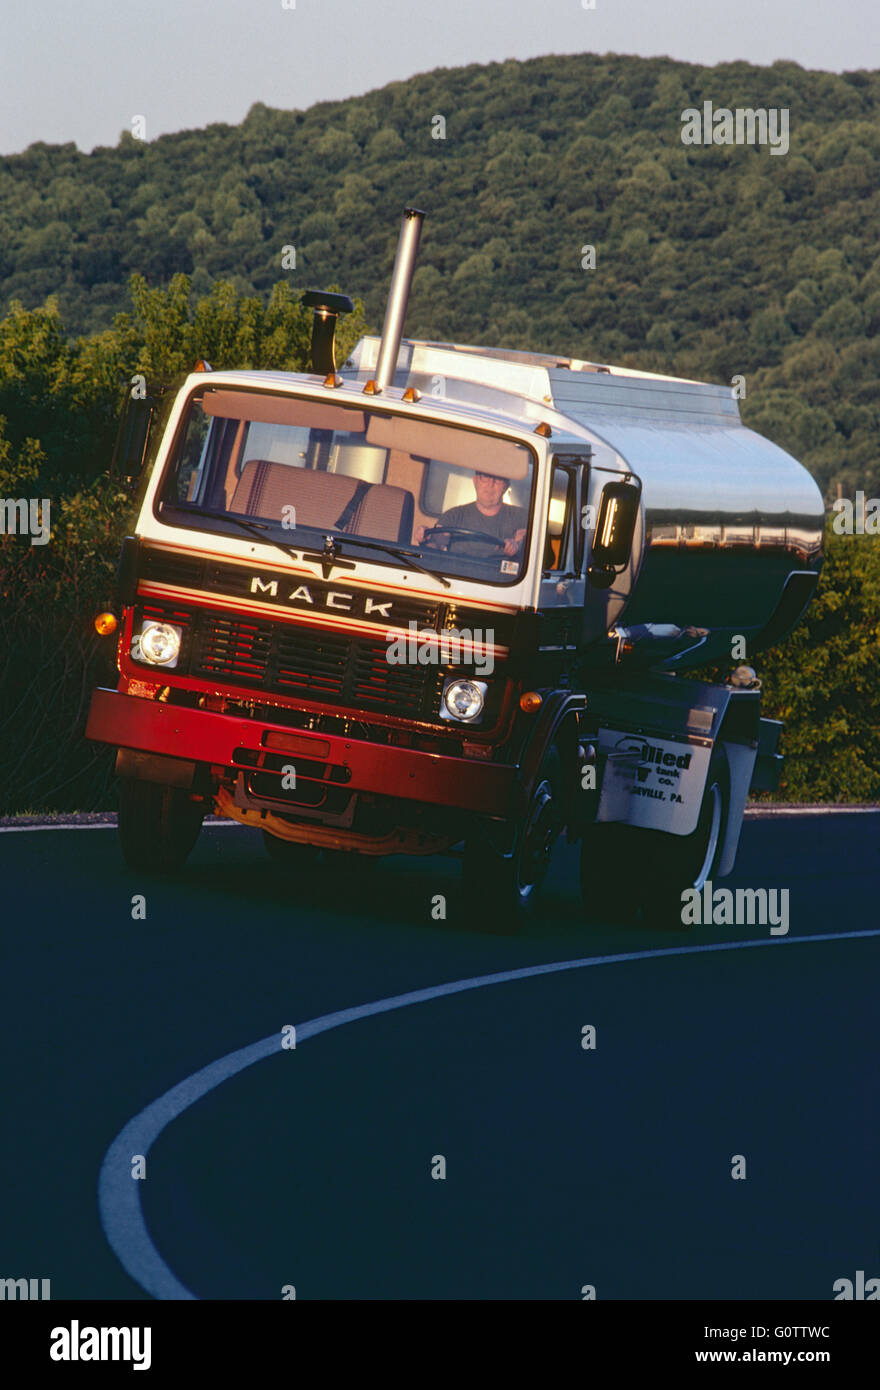 Fuel oil tanker truck traveling at dusk on rural road - Stock Image